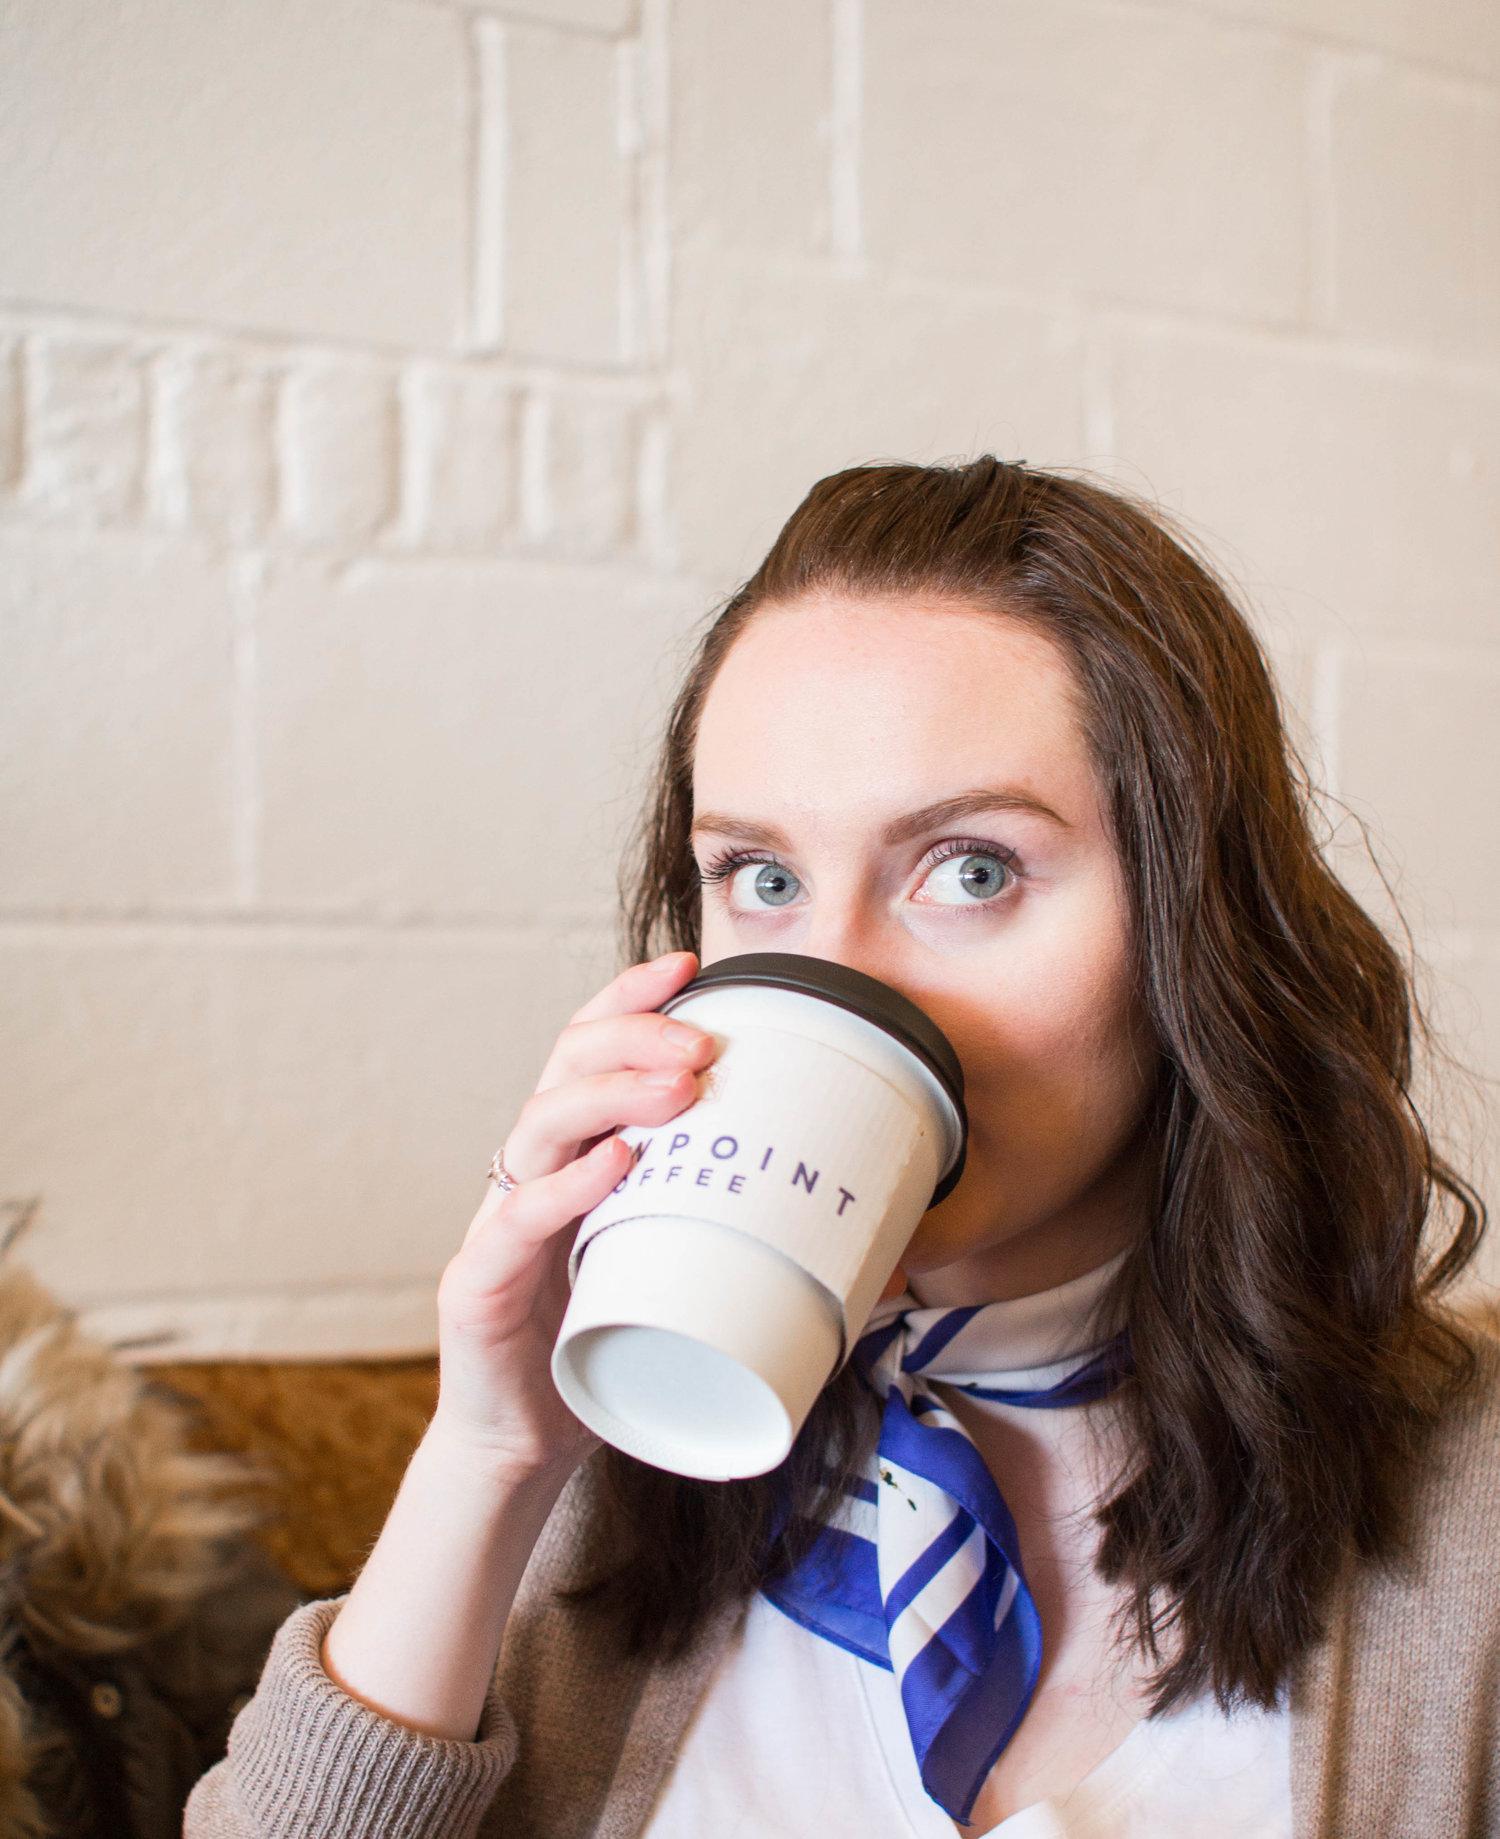 Brewpoint+Coffee+Workshop+and+Roastery.jpg